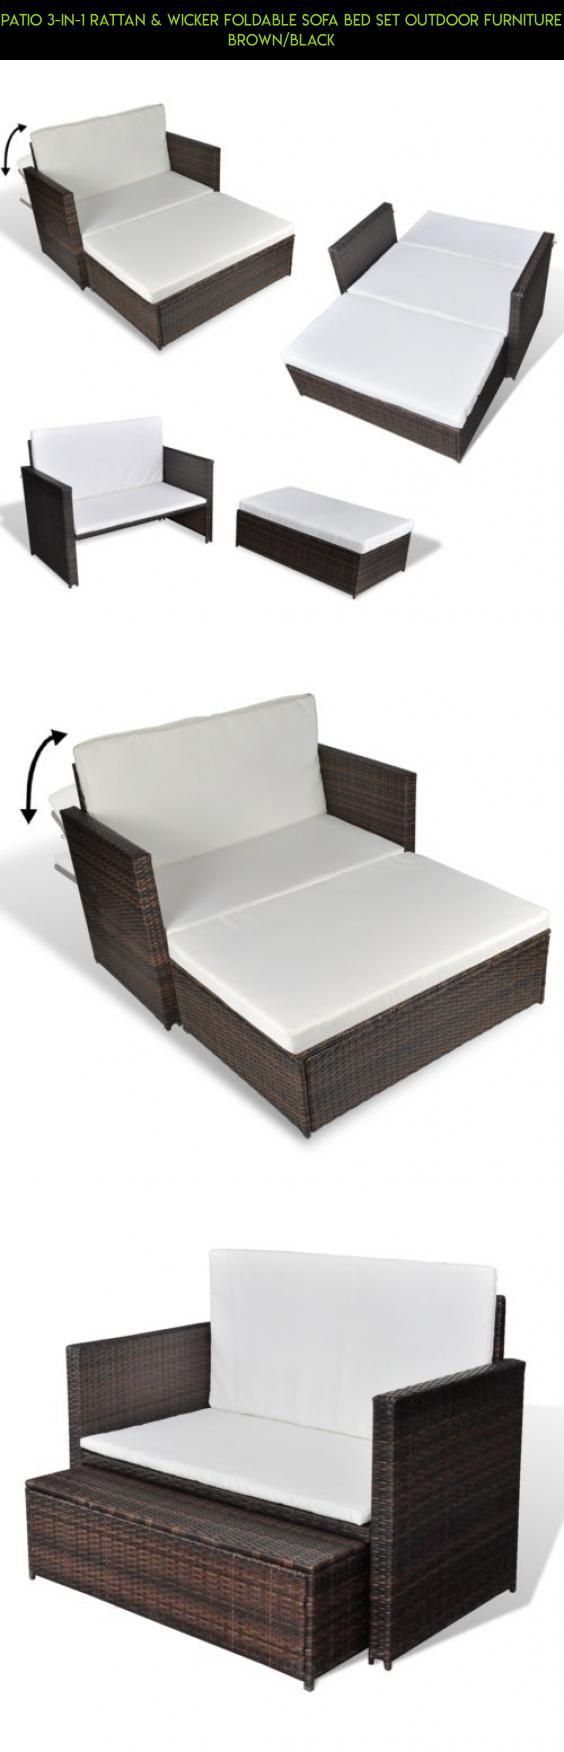 Flexsteel Sofa Patio in Rattan u Wicker Foldable Sofa bed Set Outdoor Furniture Brown